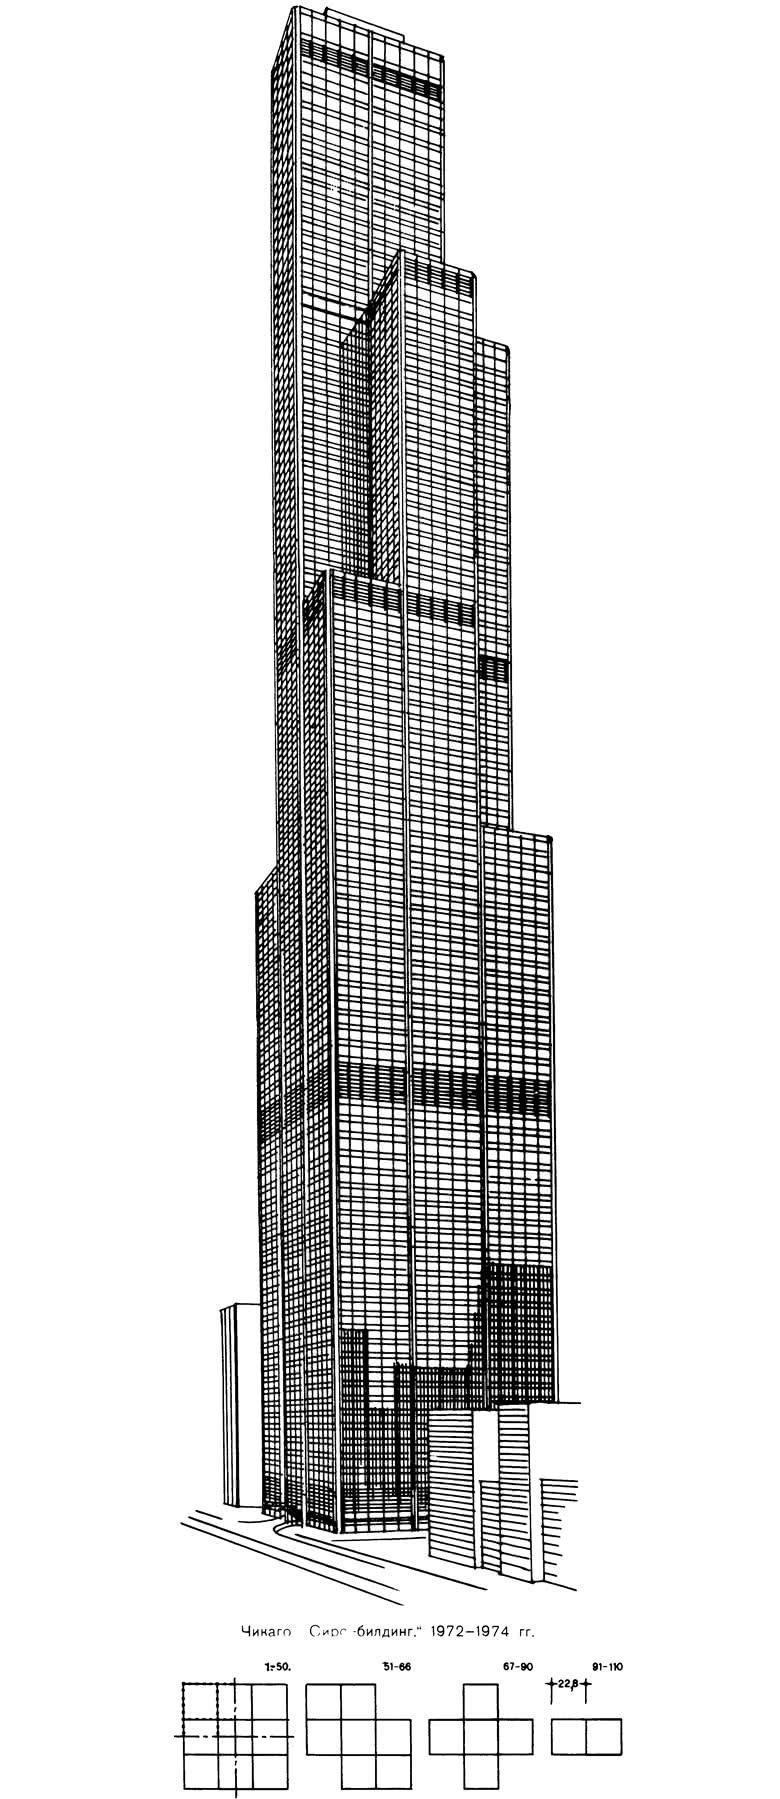 Чикаго. Сирс-билдинг, 1972-1974 гг.